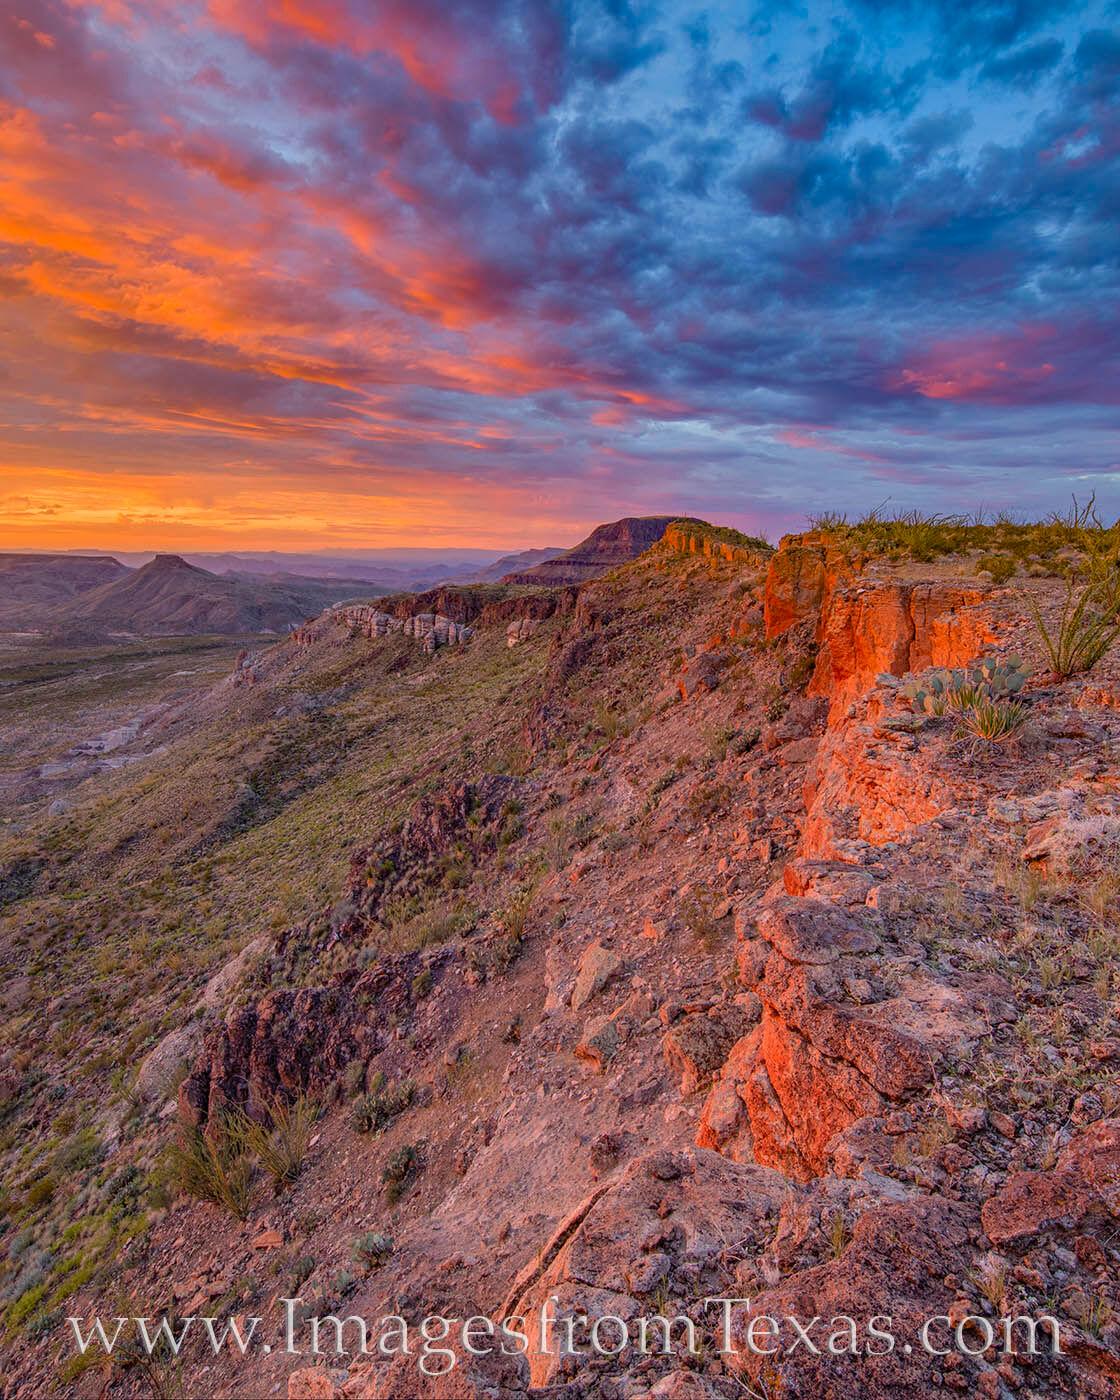 big bend ranch, state parks, sunrise, fresno canyon, texas hikes, west texas, hidden gems, best texas landscapes, texas secrets, photo